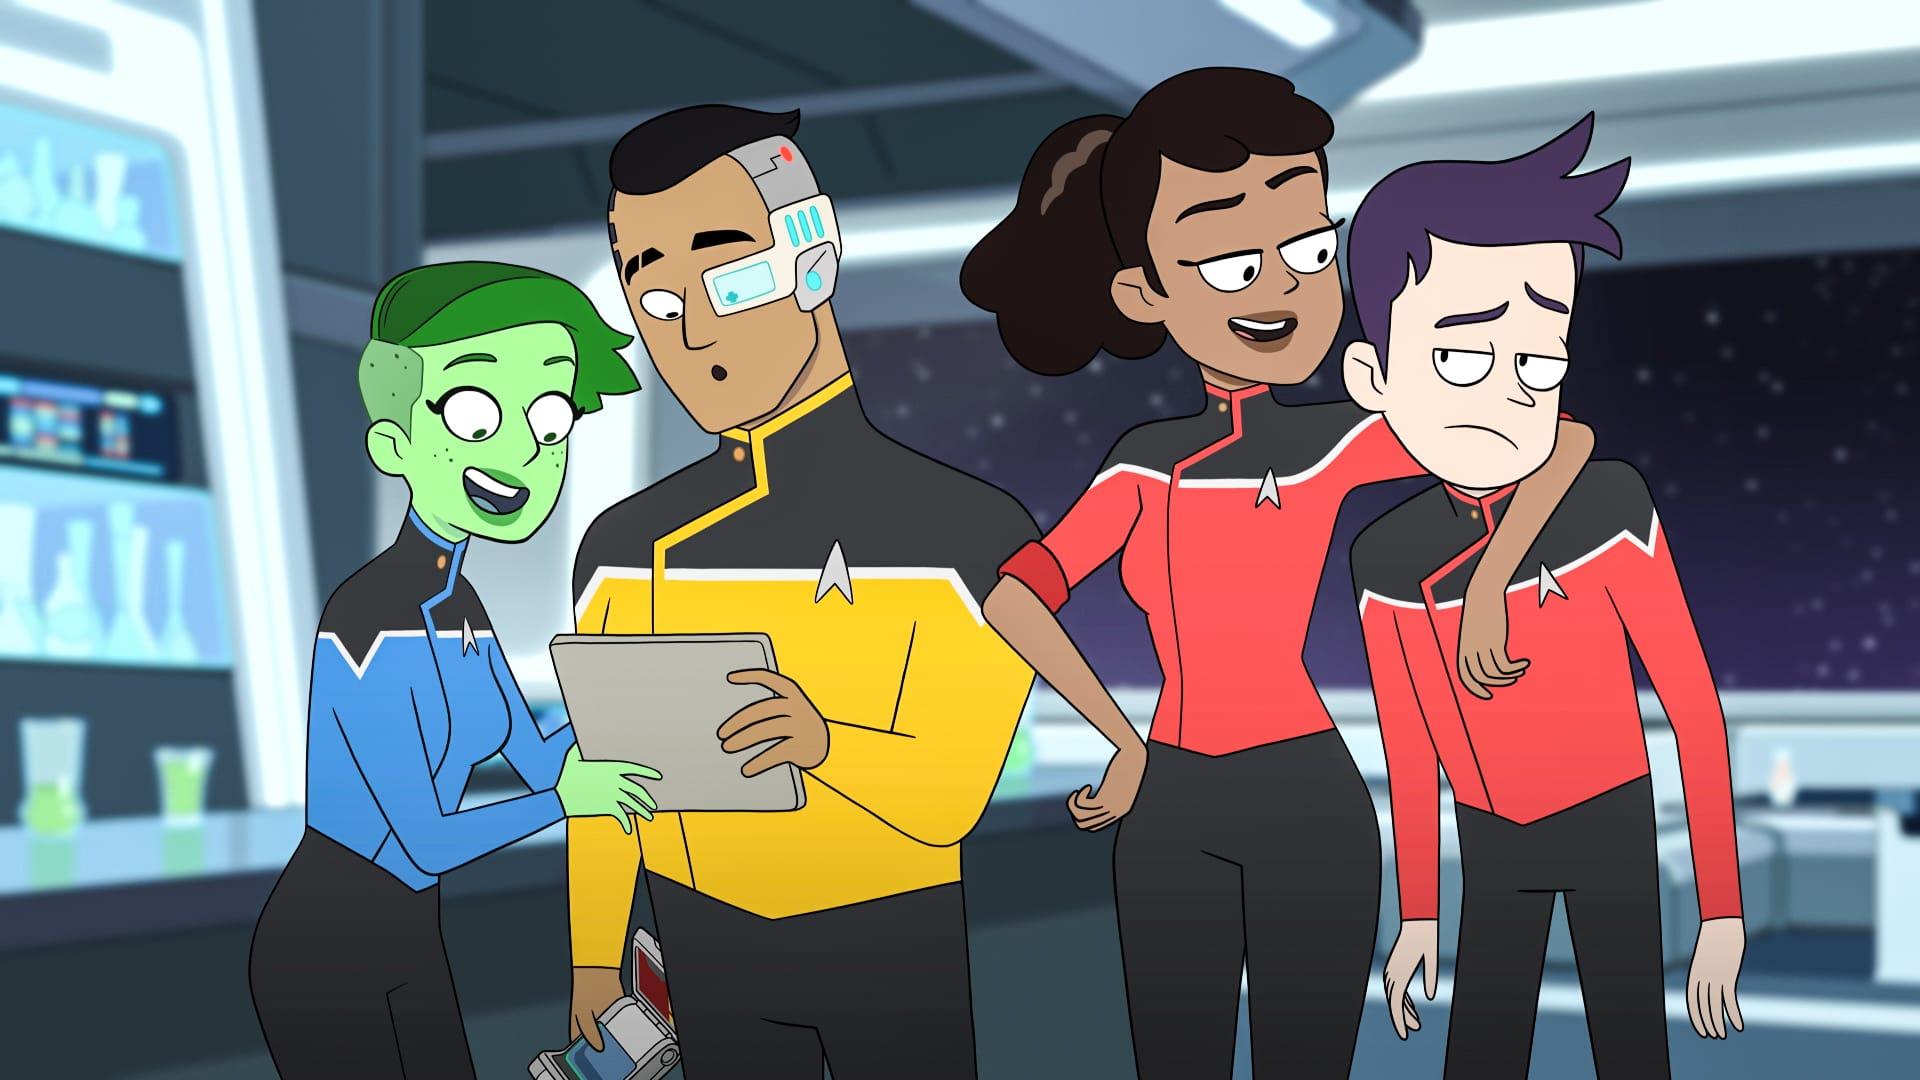 Star Trek: Lower Decks Season 1 Episode 3